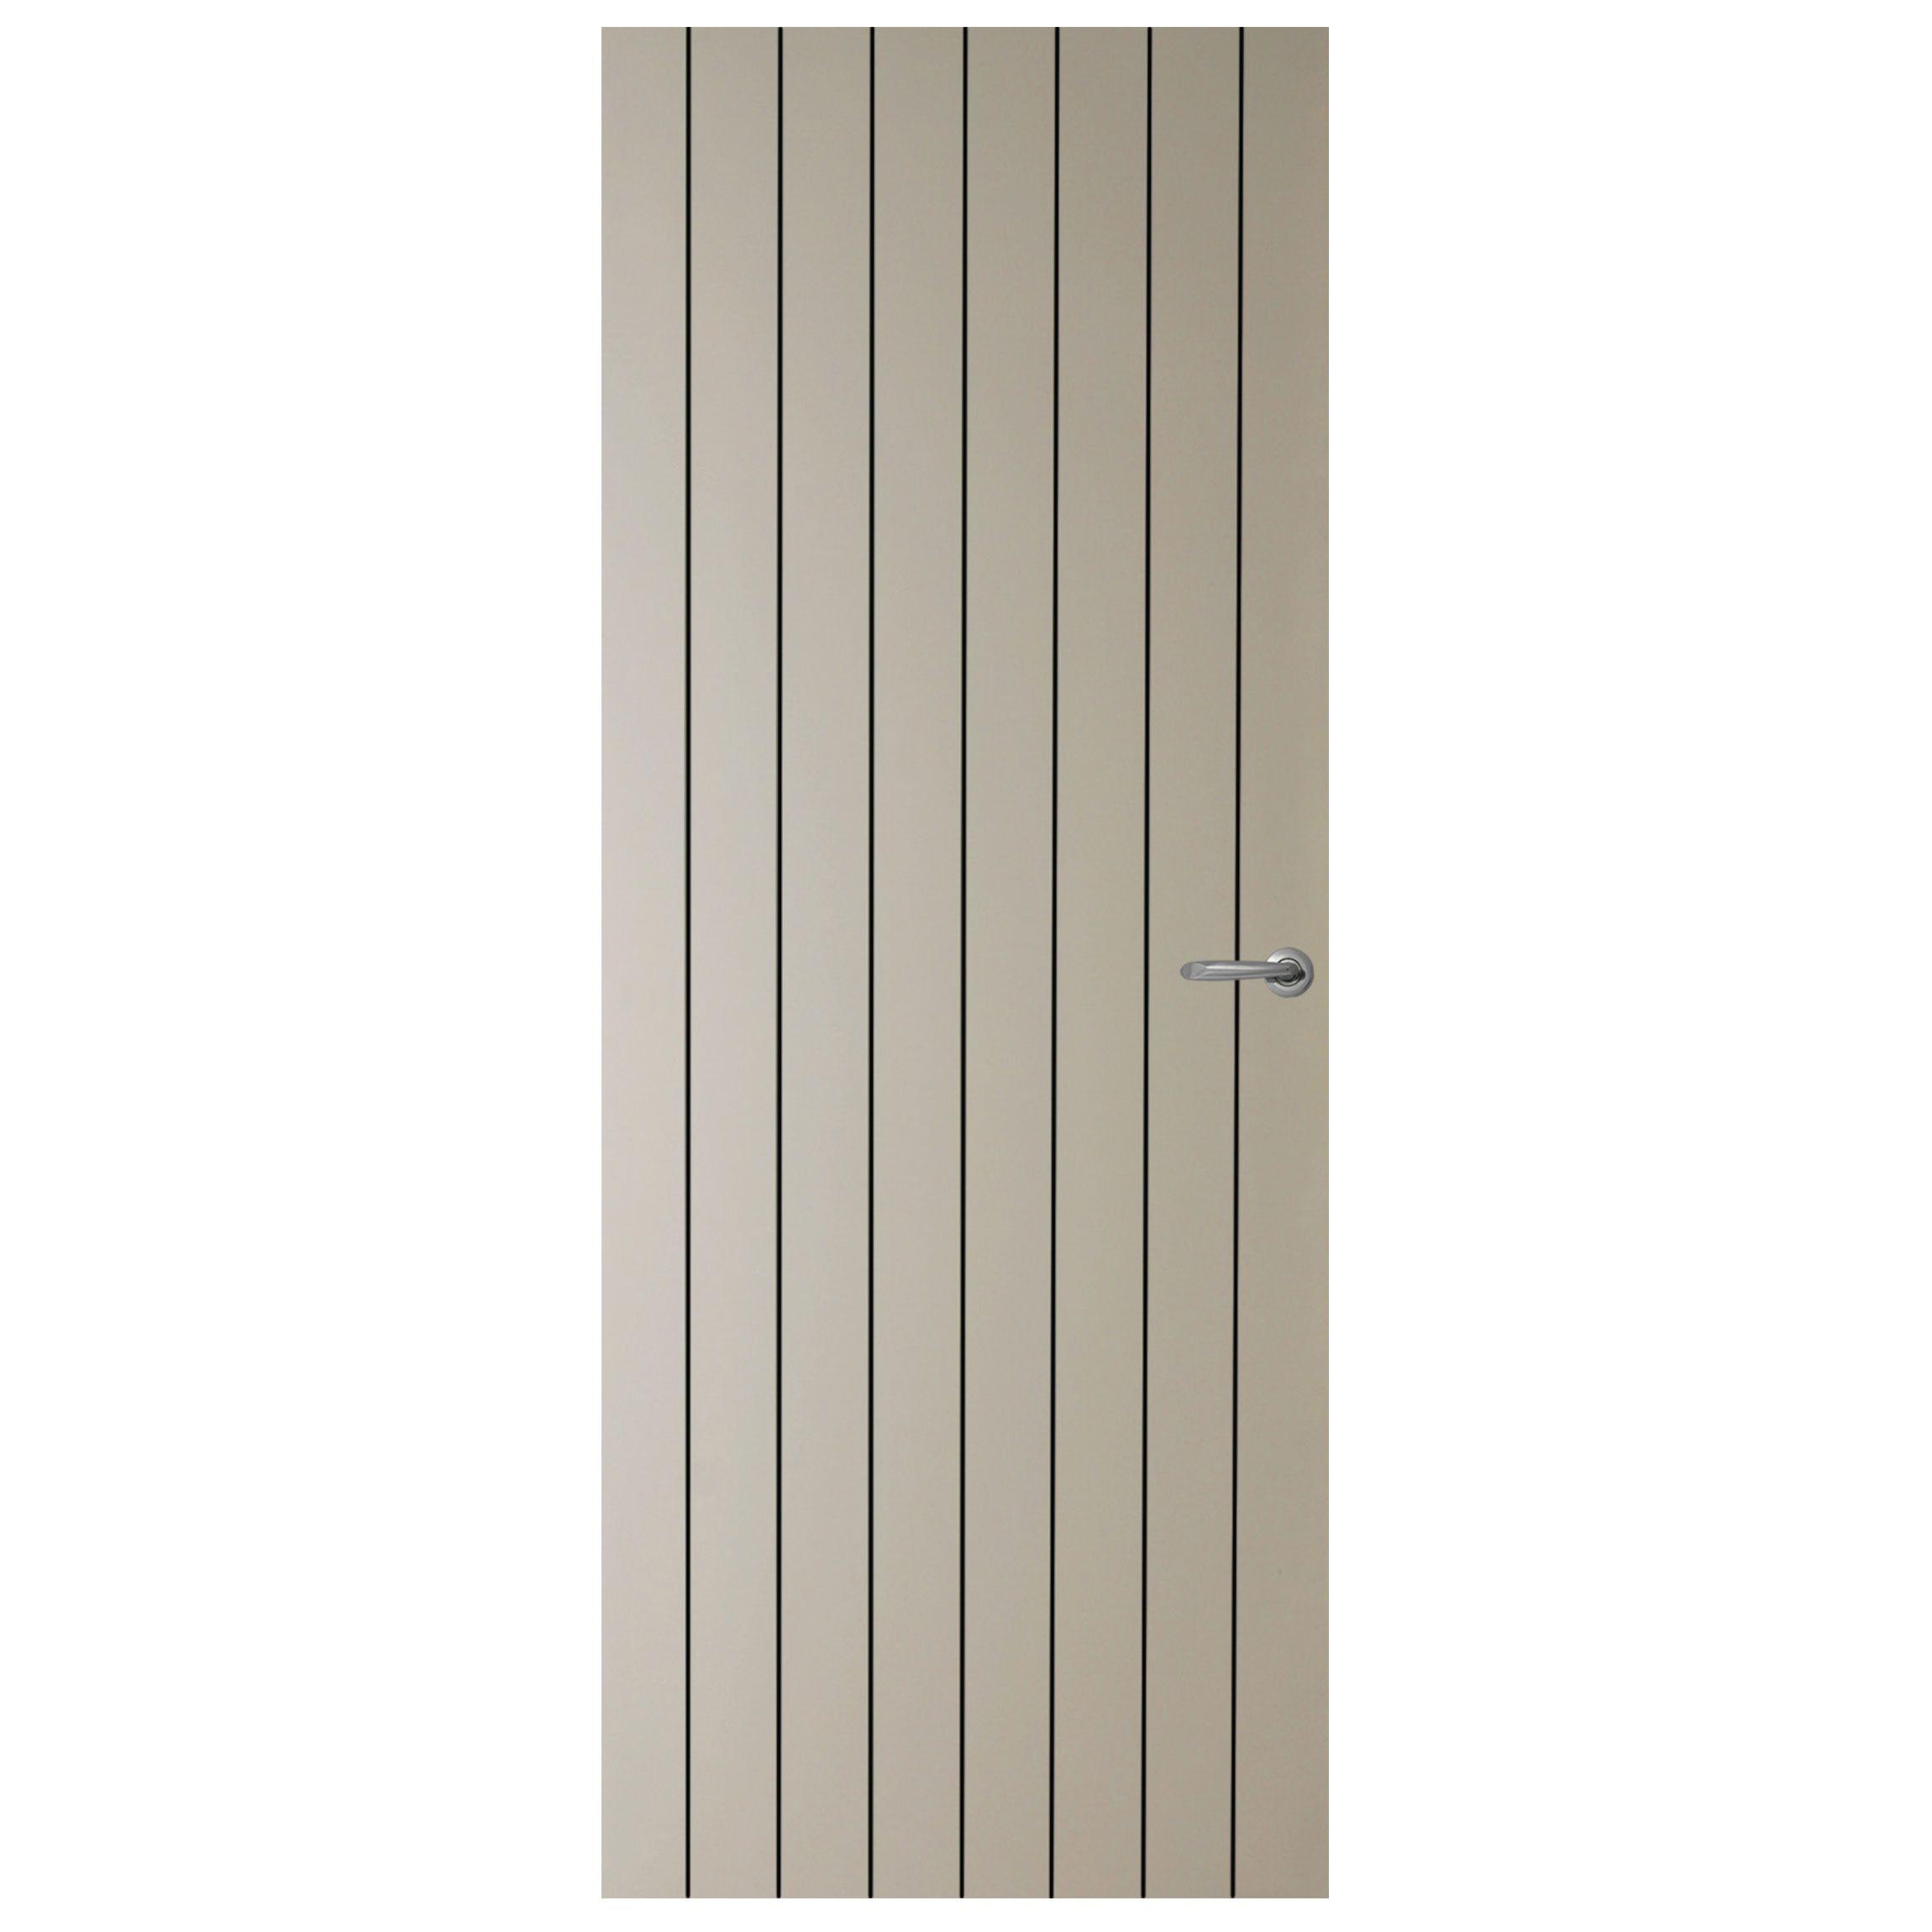 Hume 2040 X 820 X 35mm Accent Primed Internal Door Accent Doors Internal Doors Doors Interior